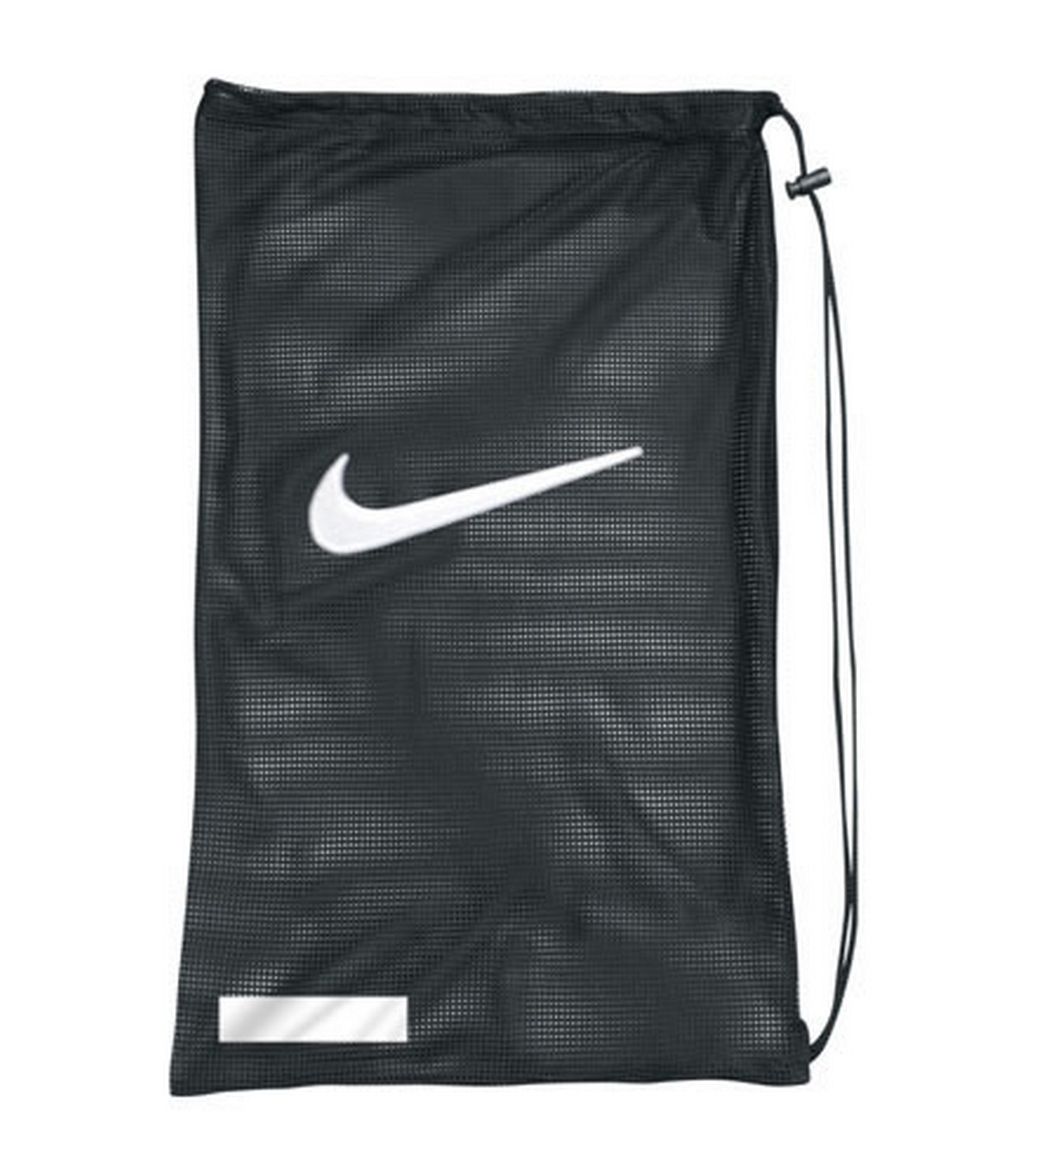 bb05363258 Nike Swim Mesh Equipment Bag at SwimOutlet.com